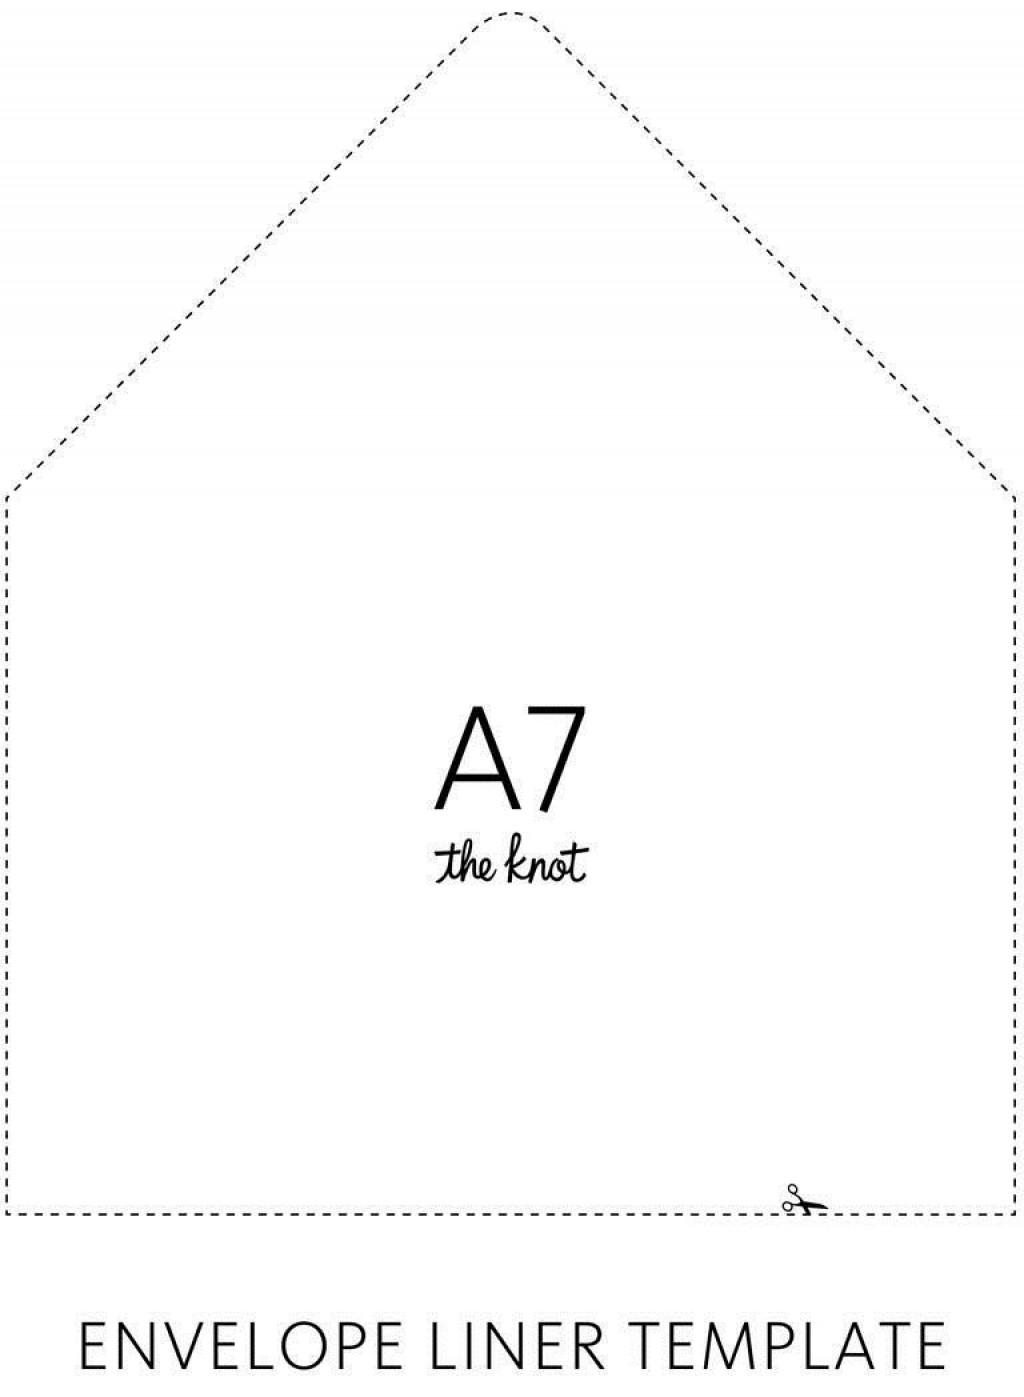 004 Stirring A7 Envelope Liner Template Picture  Printable Illustrator FreeLarge